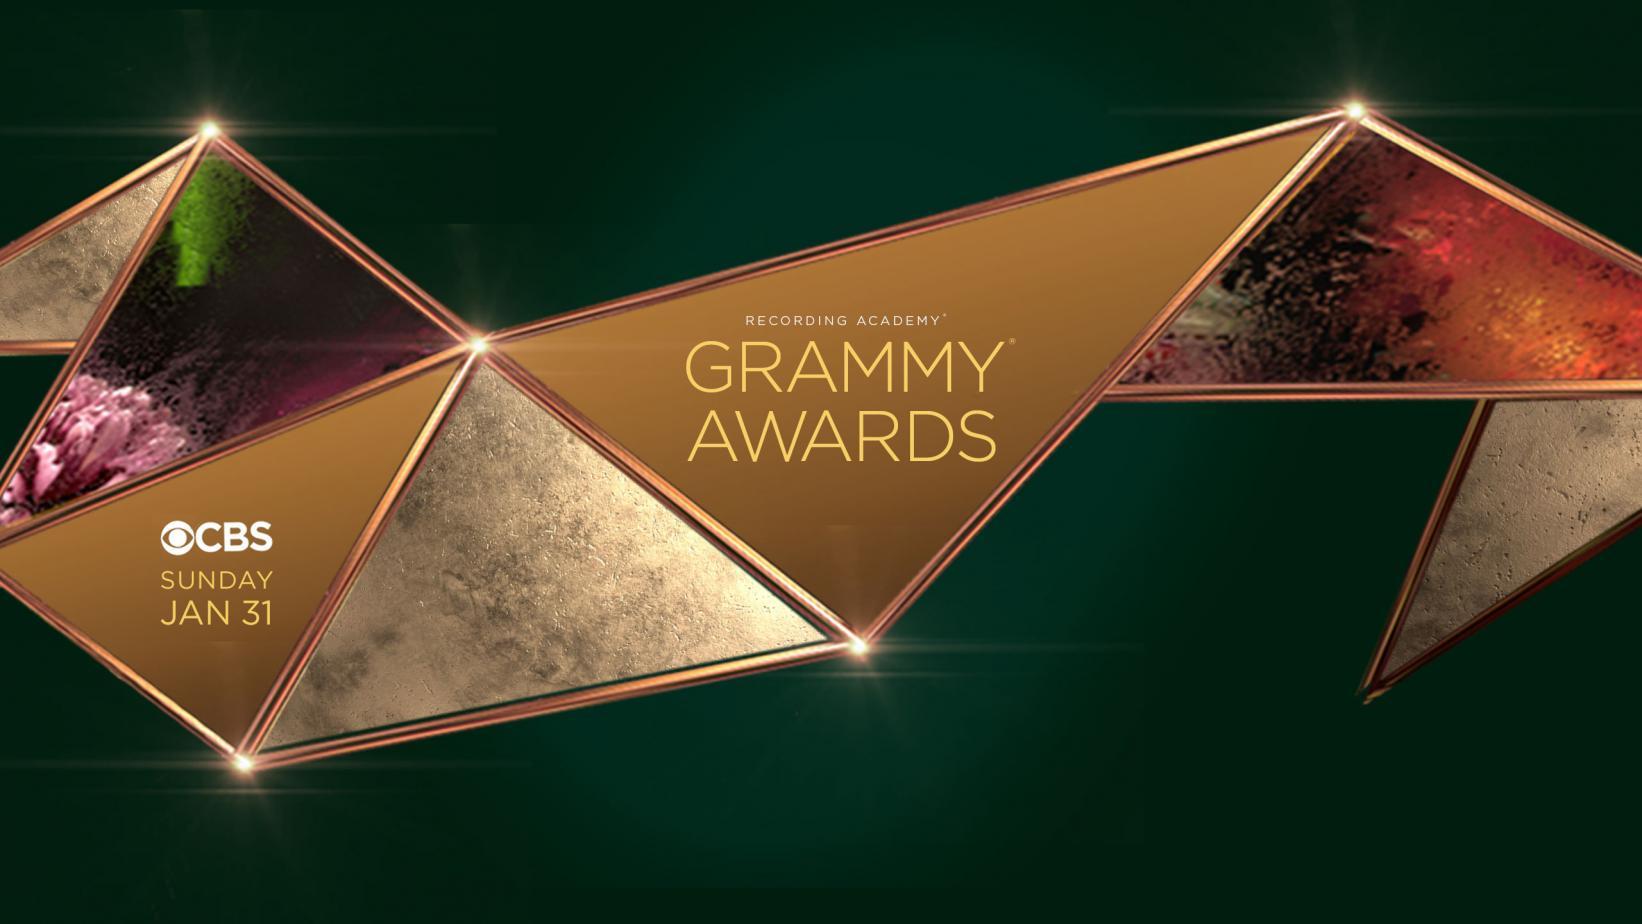 Full list of Grammy Awards 2021 nominations